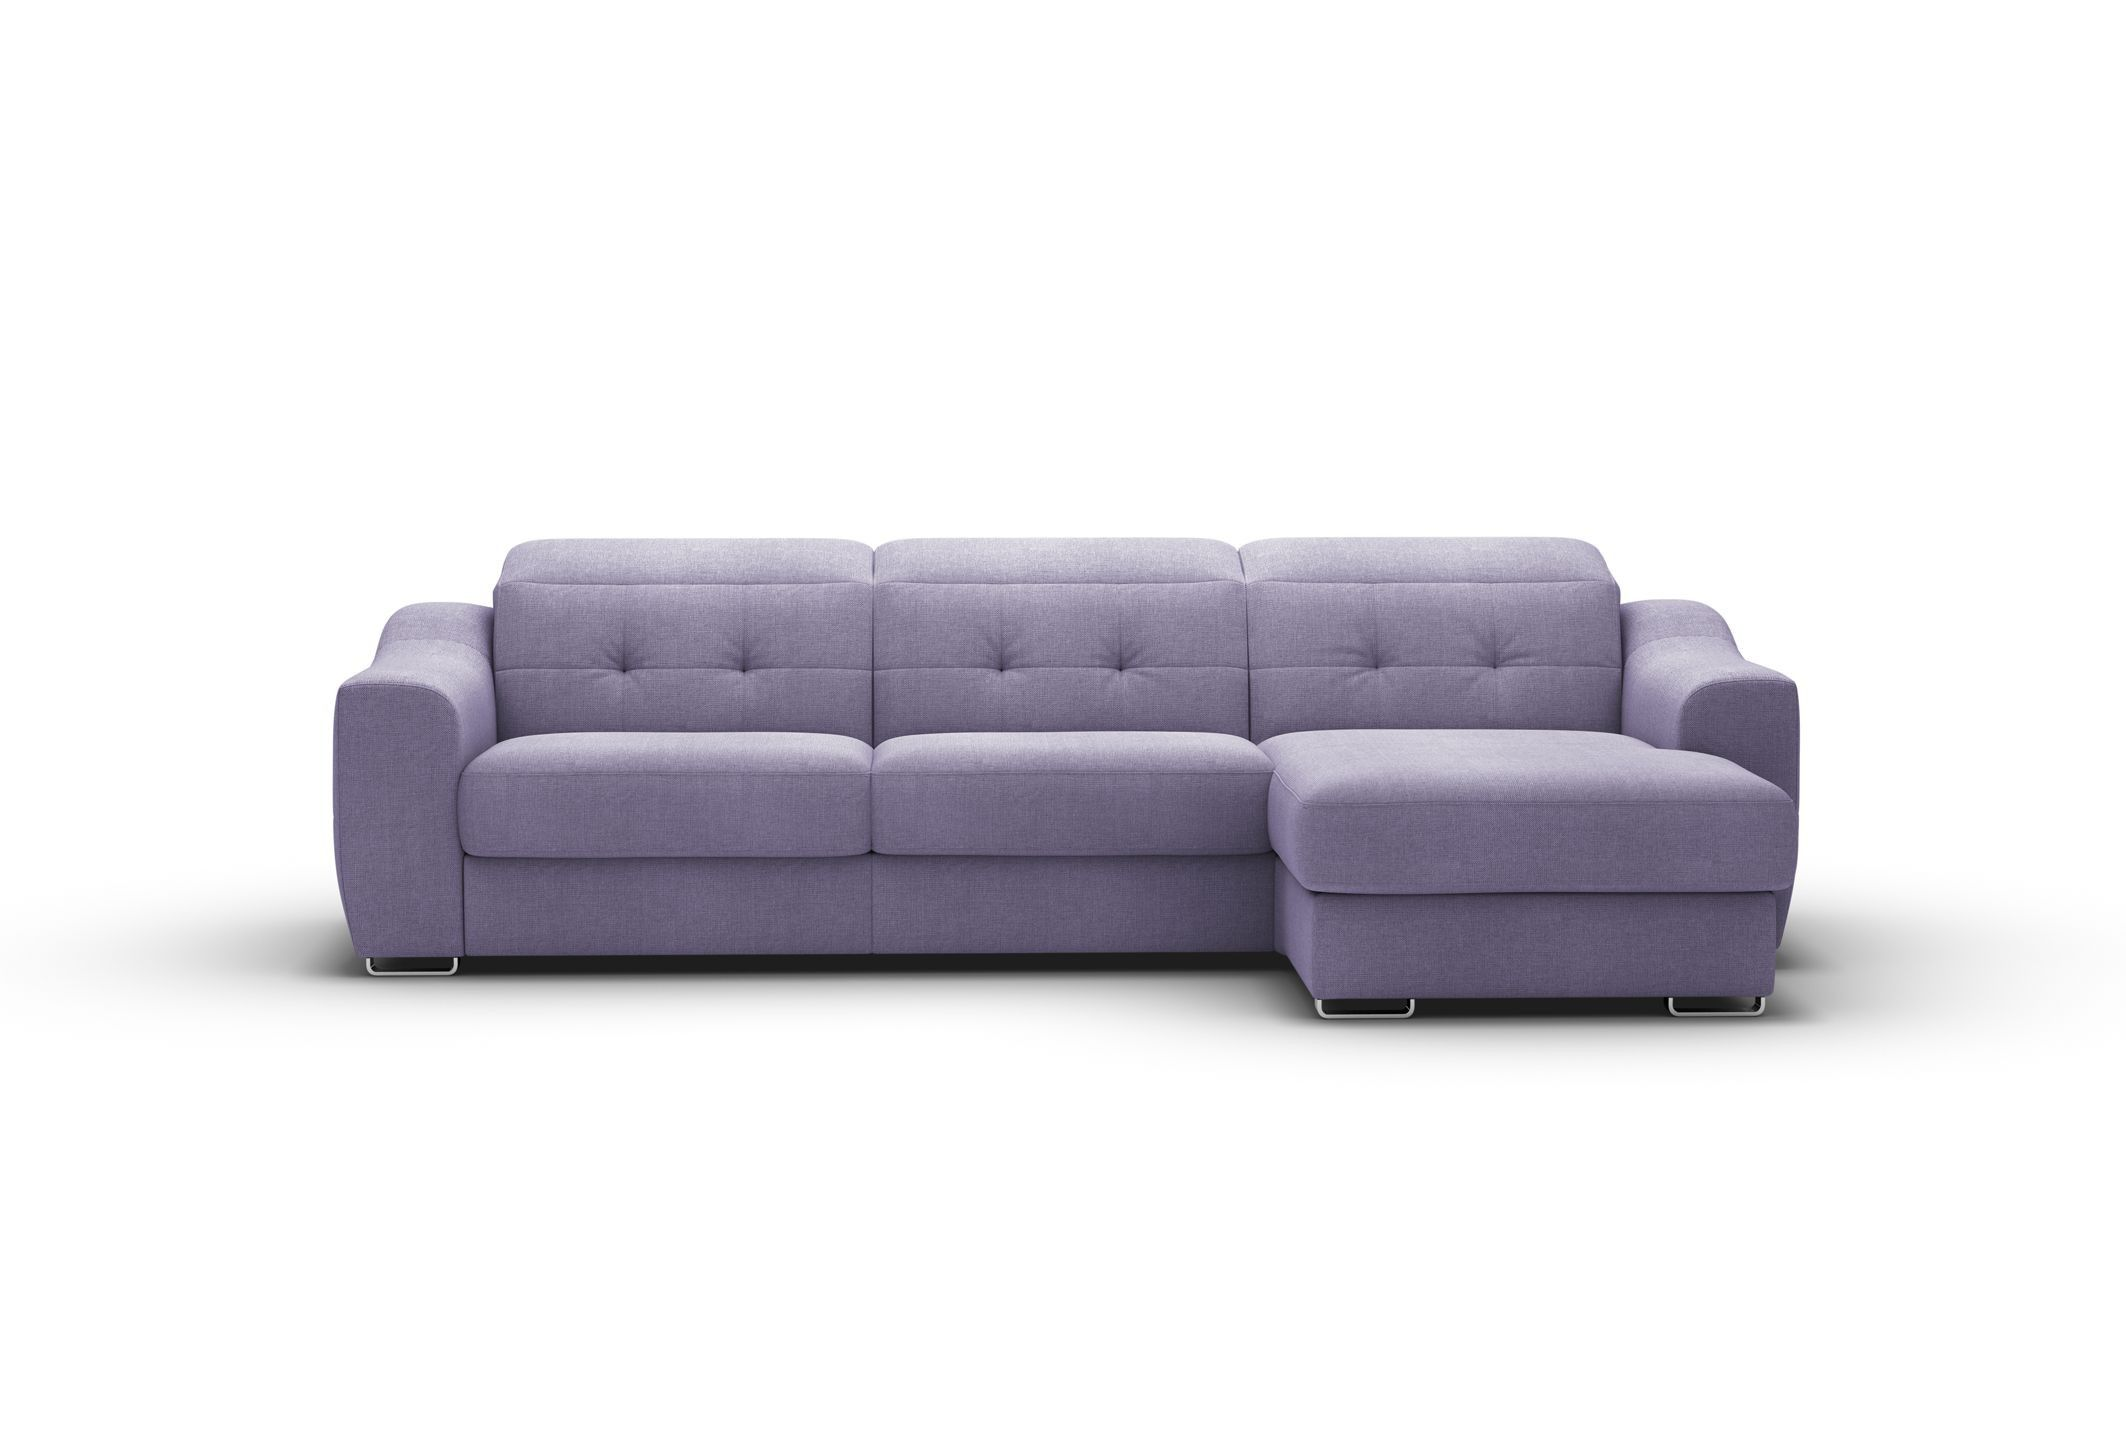 Cado Modern Furniture Tv015 Modern Tv Stand Modern Tv Stand